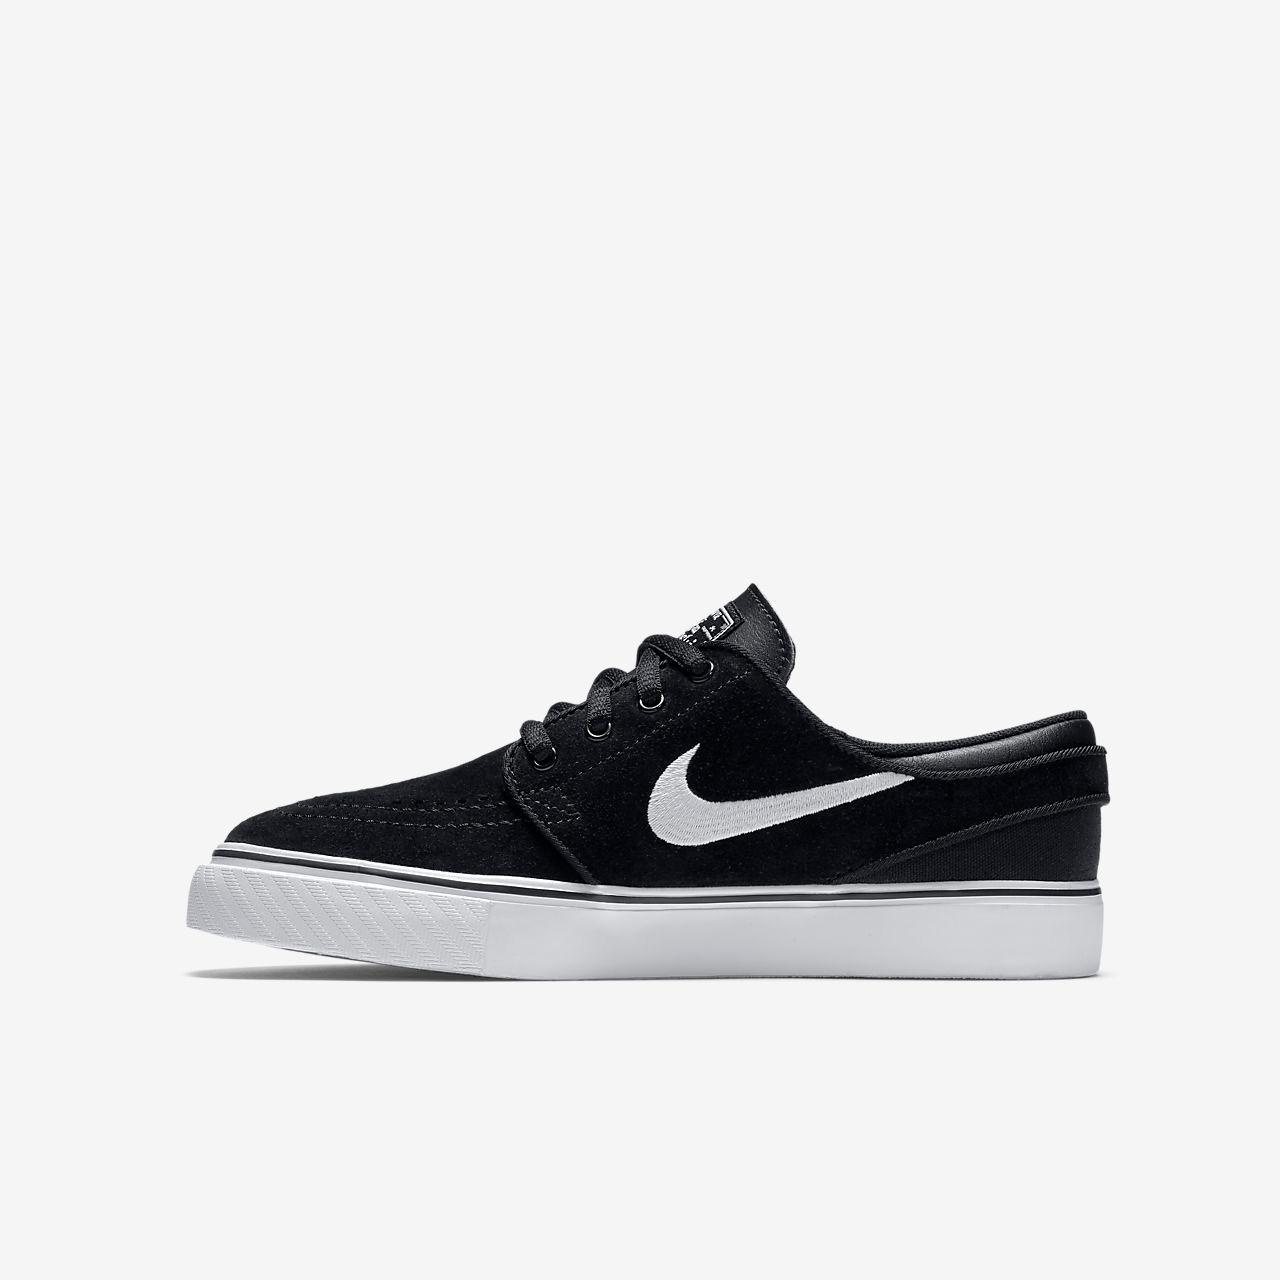 3387cfbab3db6 sb-zoom -stefan-janoski-older-skateboarding-shoe-BLTBW2DE-1__25884.1513785440.1280.1280.jpg